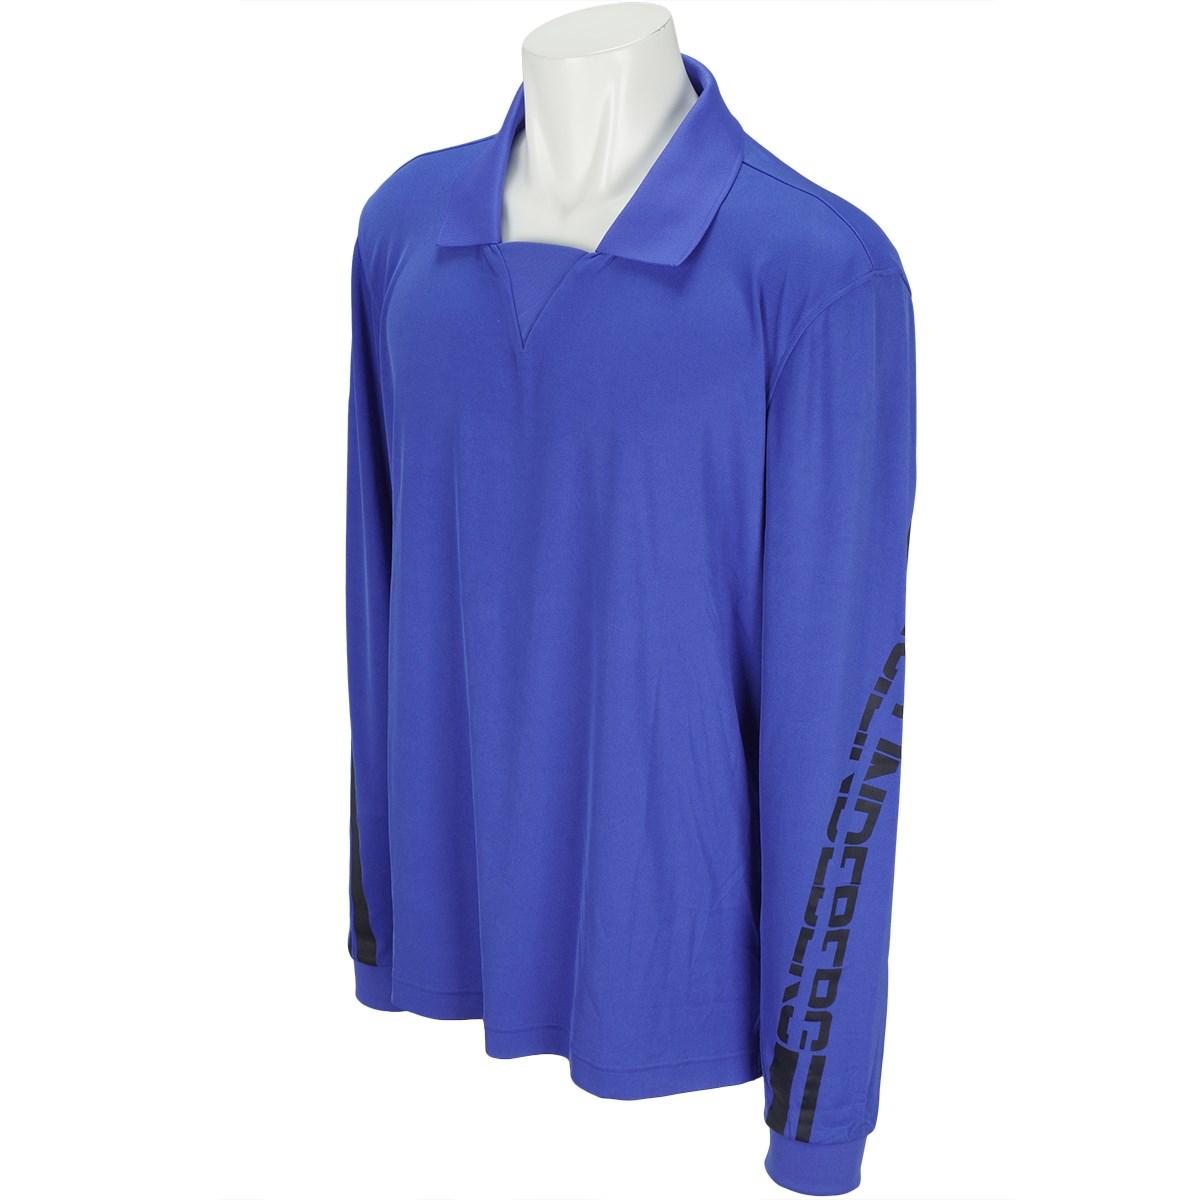 J.リンドバーグ J.LINDEBERG M6A Elias SliLux Pique 長袖シャツ 46 ブルー